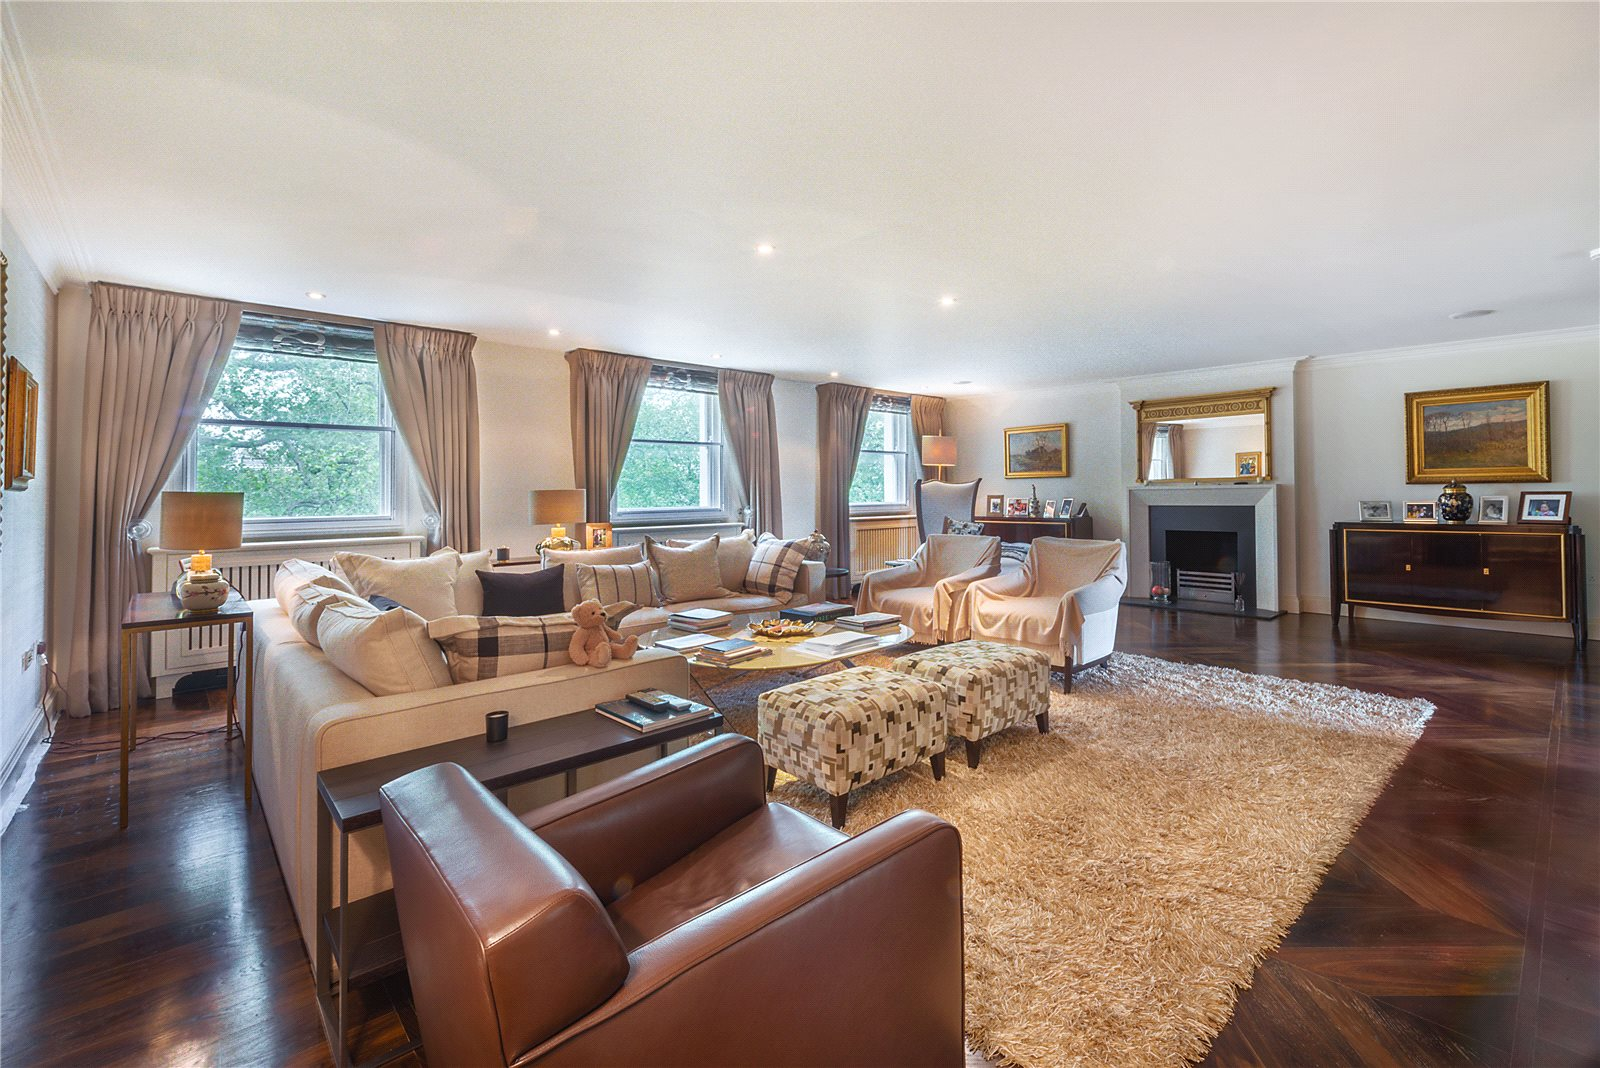 Apartamentos para Venda às Eaton Square, London, SW1W London, Inglaterra